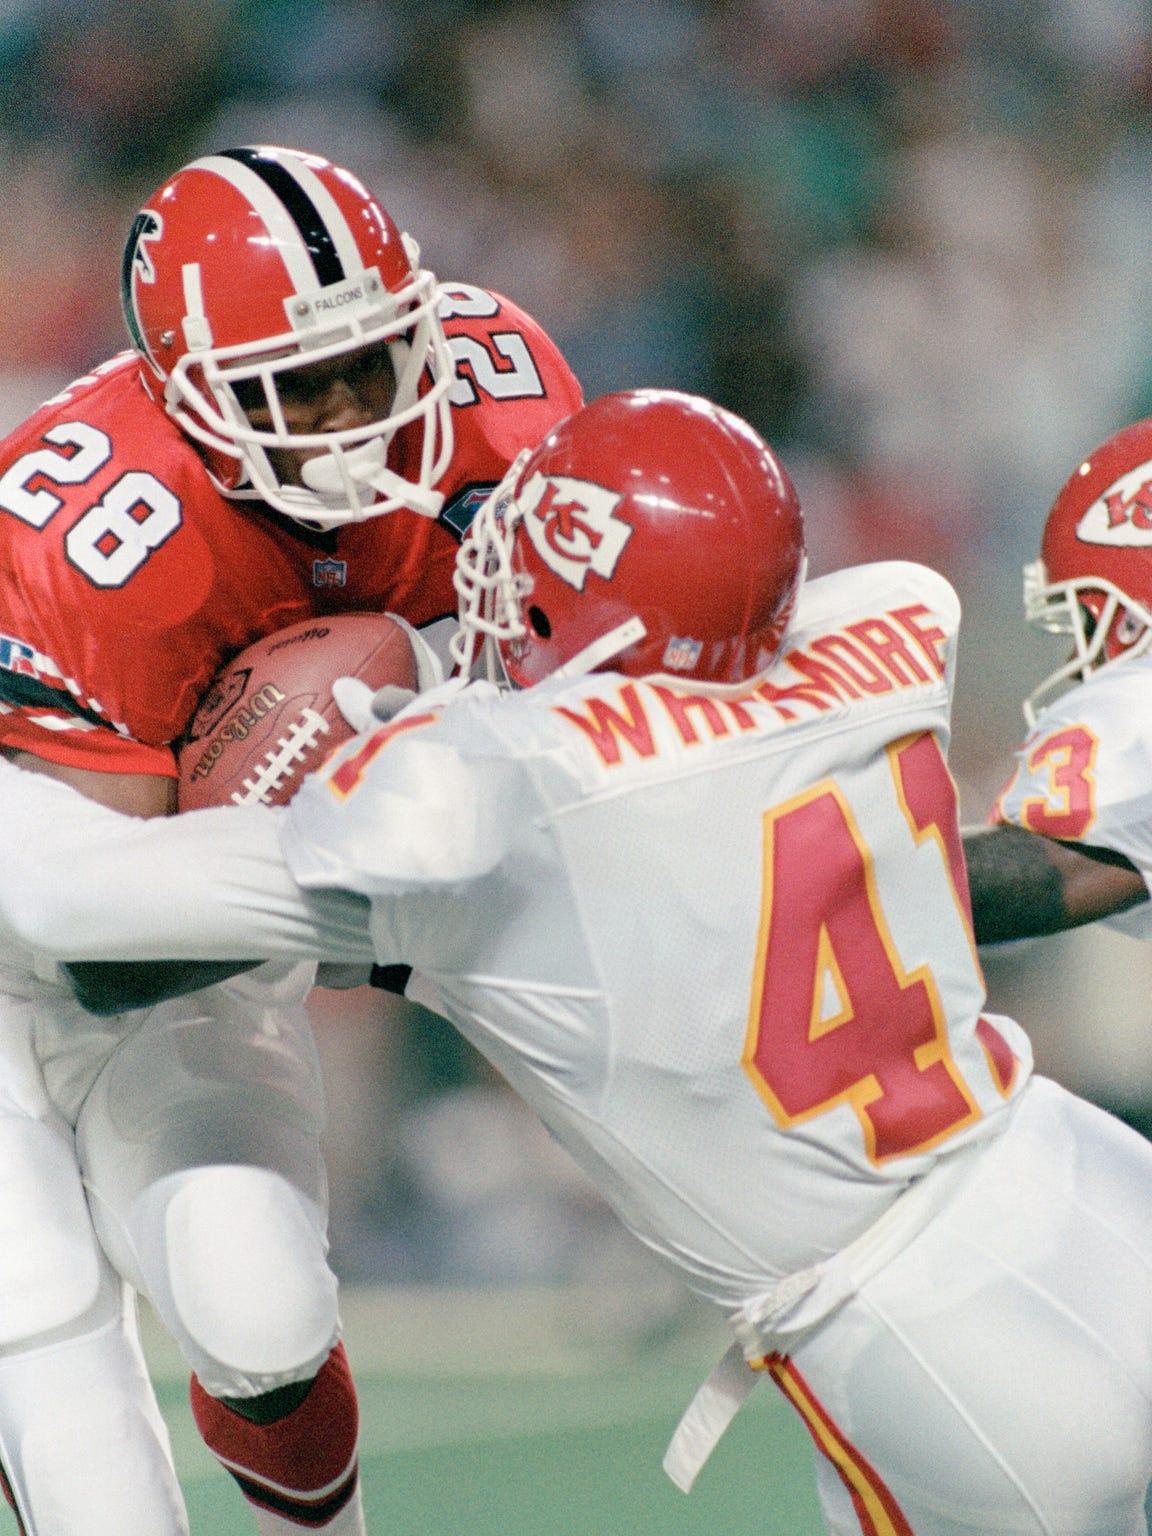 Atlanta Falcons running back Tony Smith is hit by Kansas City Chiefs safety David Whitmore on the opening kickoff on Sept. 18, 1994 in Atlanta.